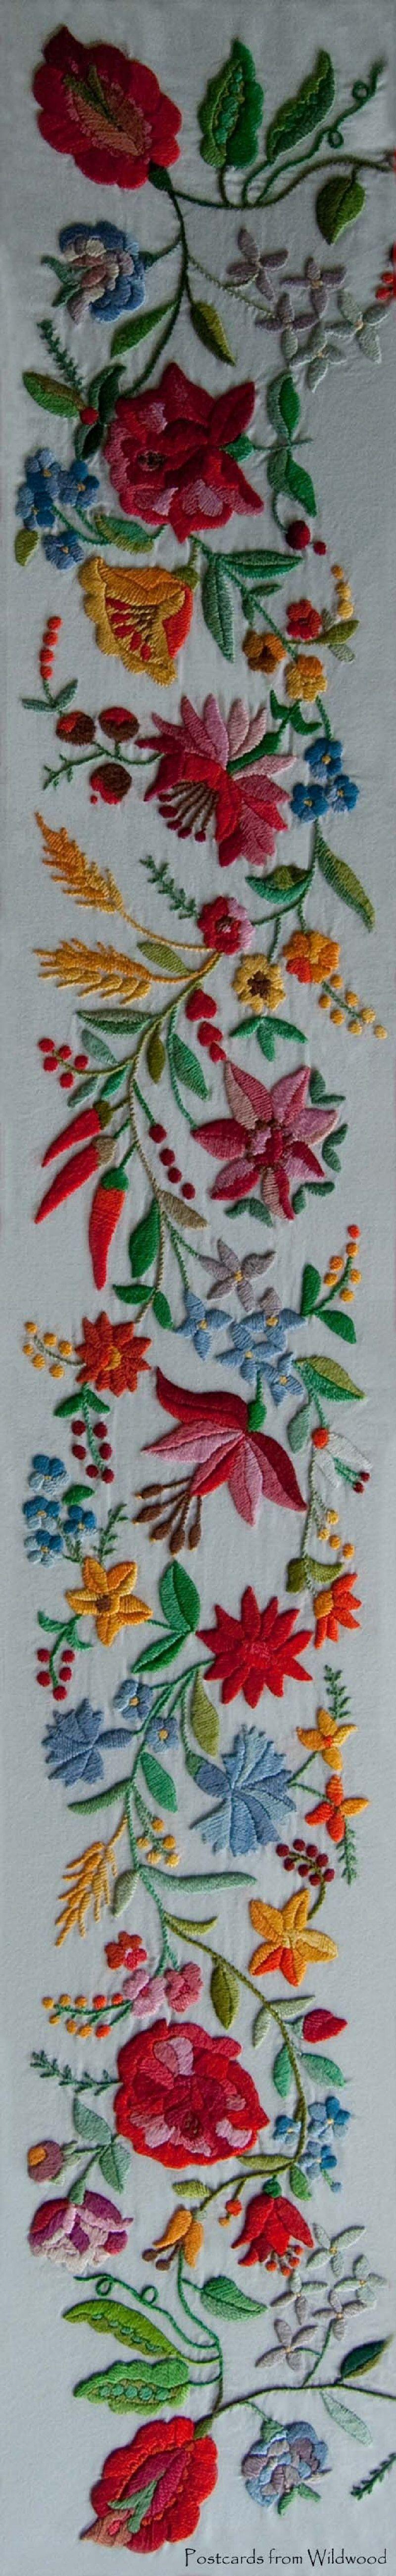 I ❤ Embroidery Hungarian Kalocsai Embroidery Hungarian